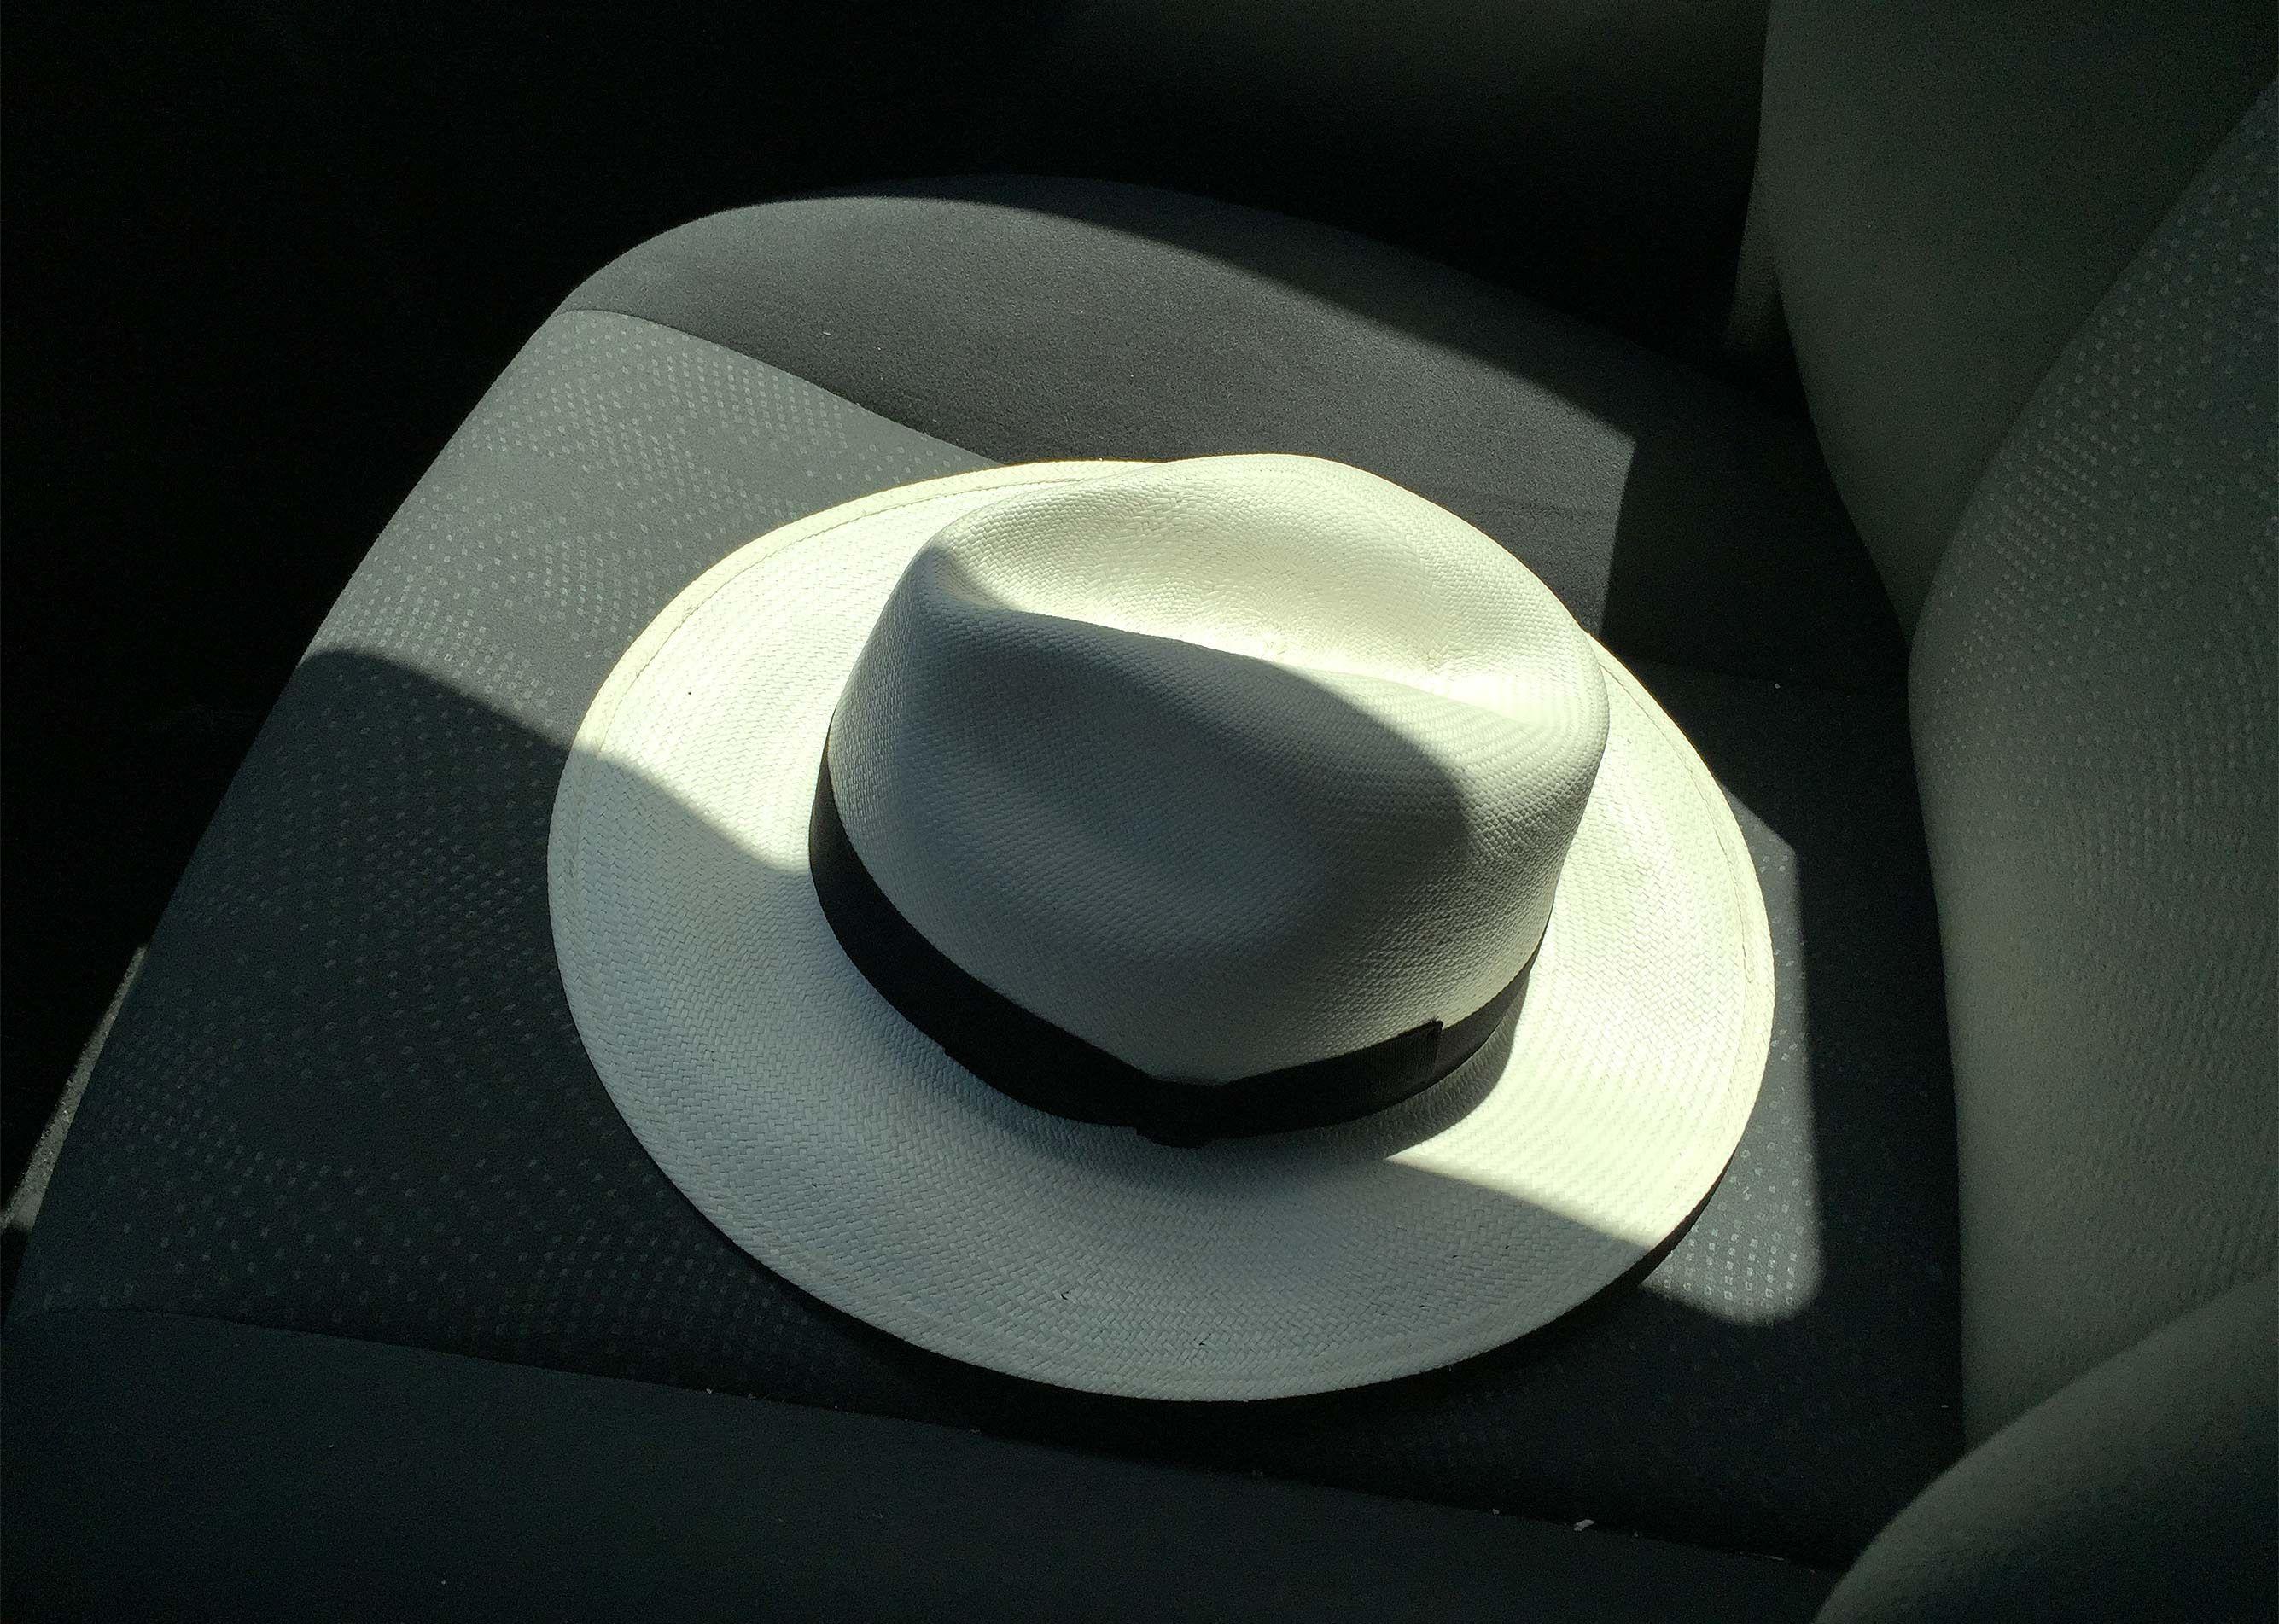 Hat-seatIMG_4918.jpg